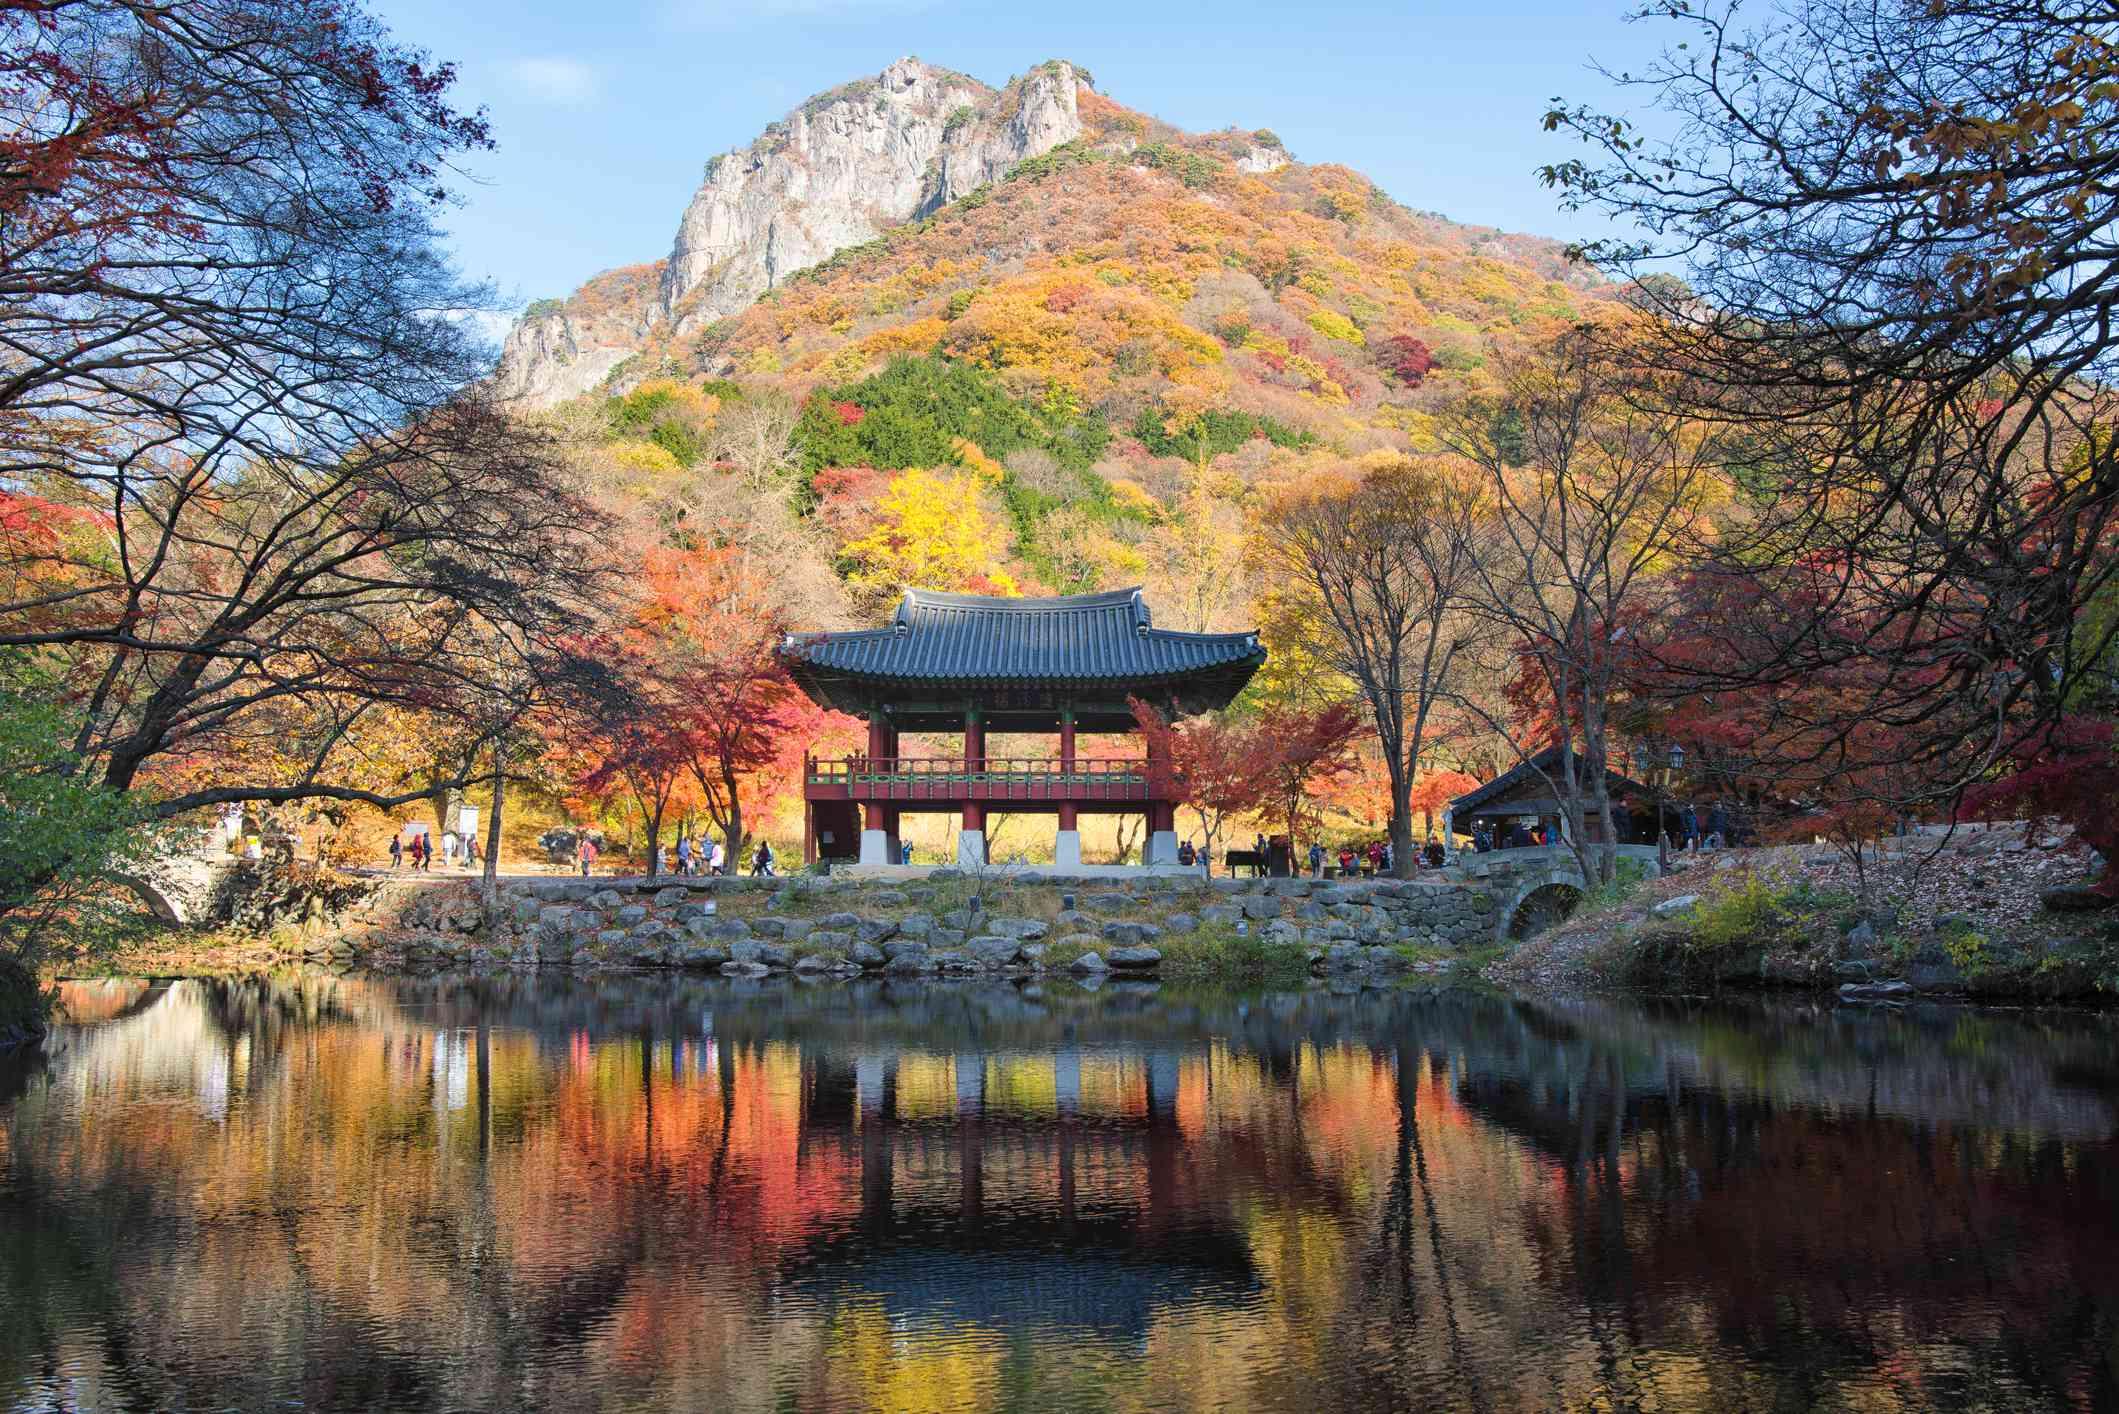 Baekyangsa Temple in Jangseong County, South Korea